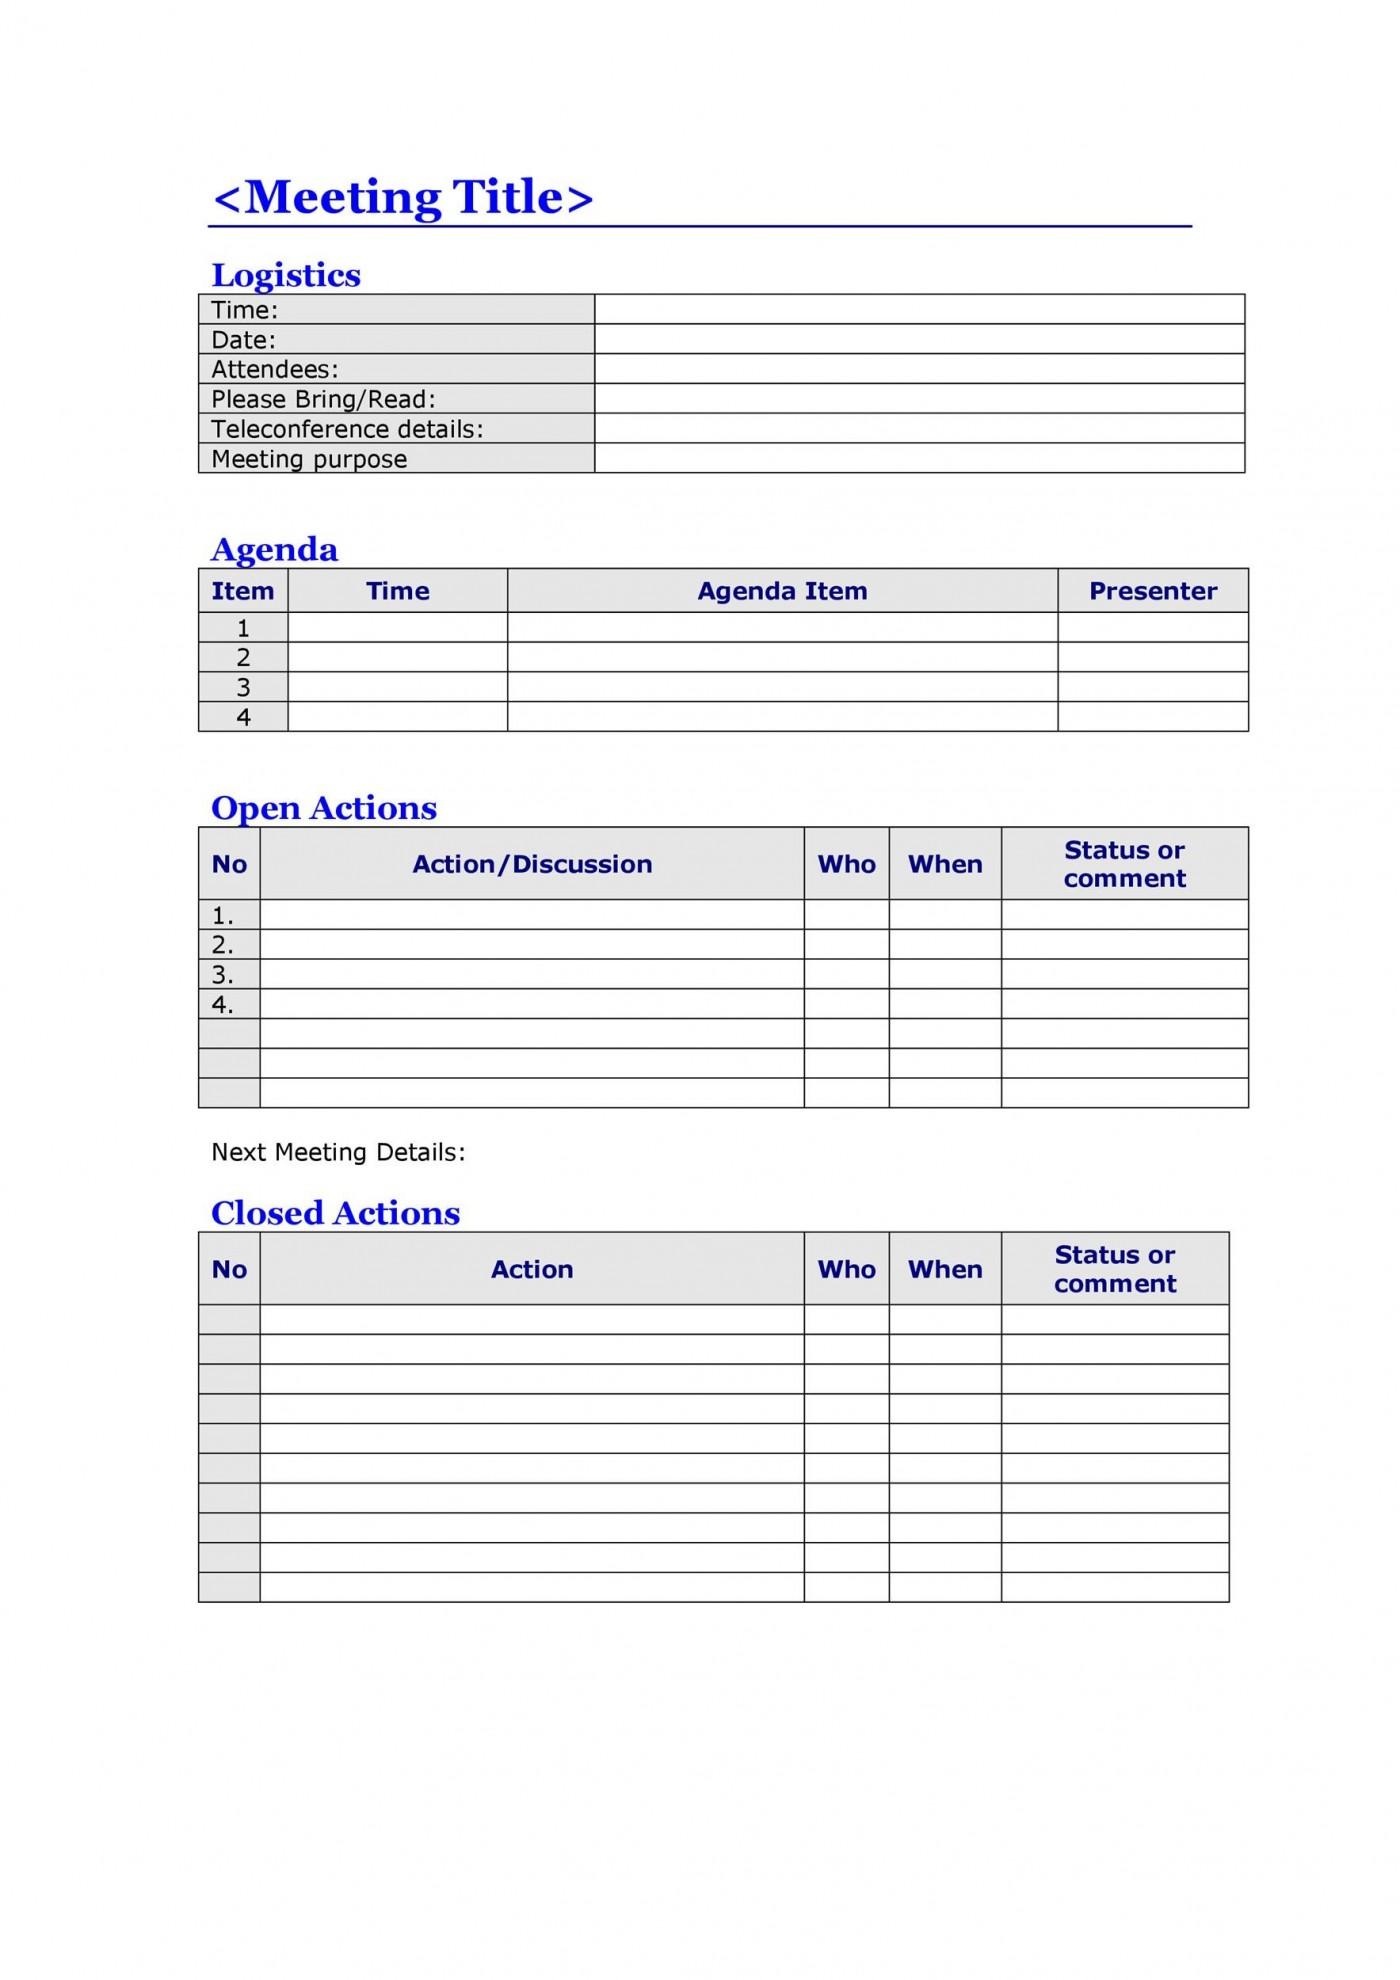 008 Top Meeting Agenda Template Word Image  Microsoft Board 2010 Example1400